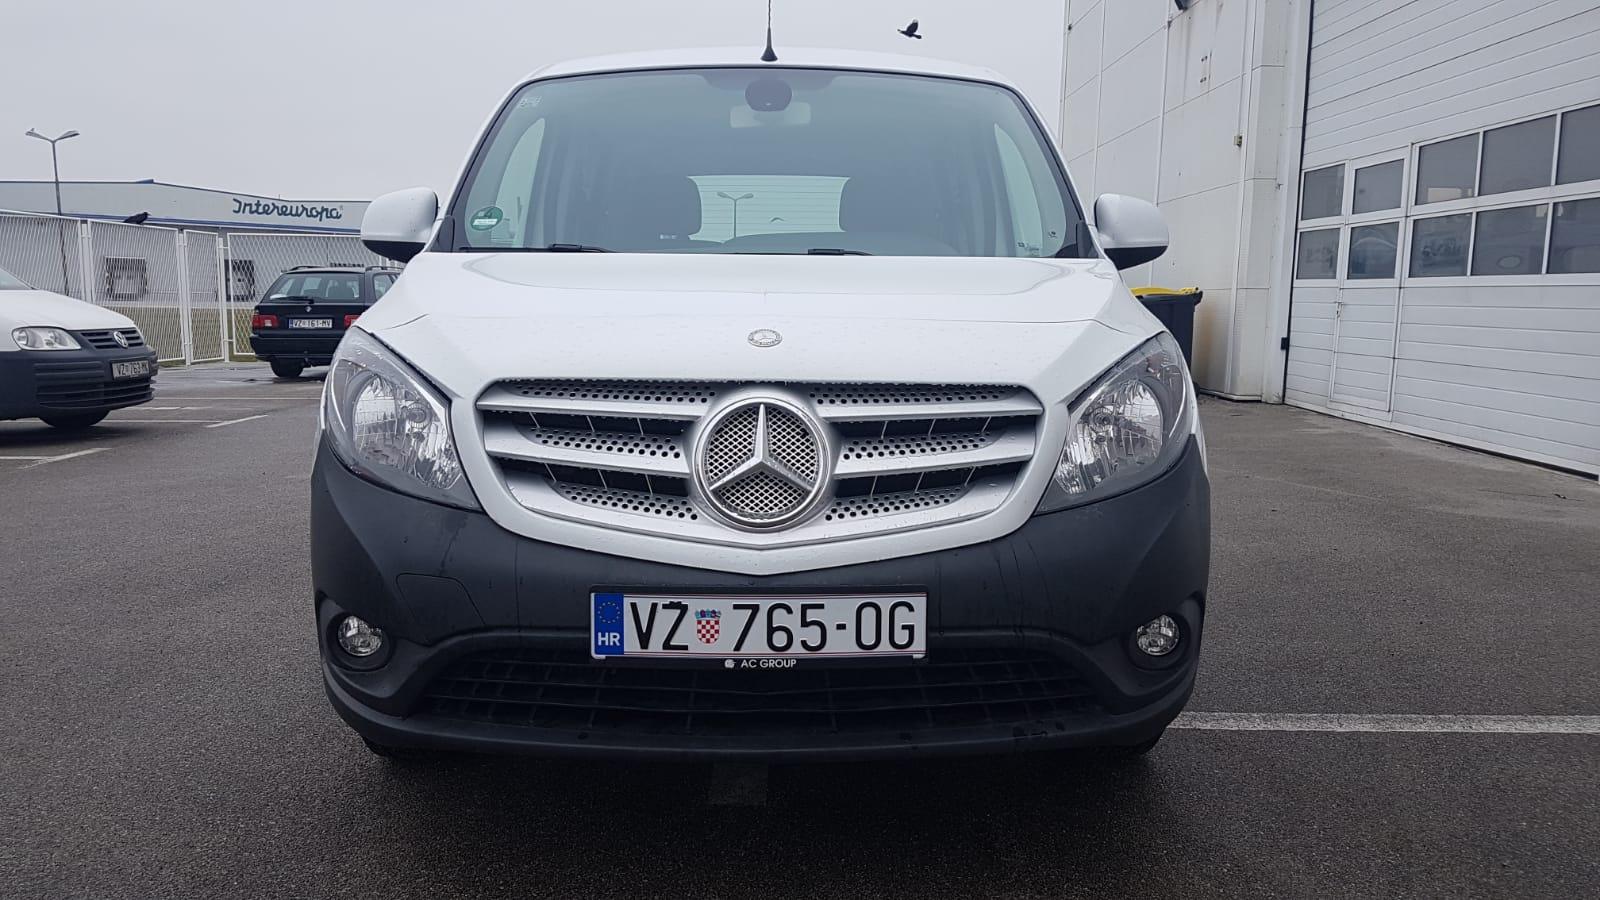 Mercedes Citan (VŽ 765-OG) 7